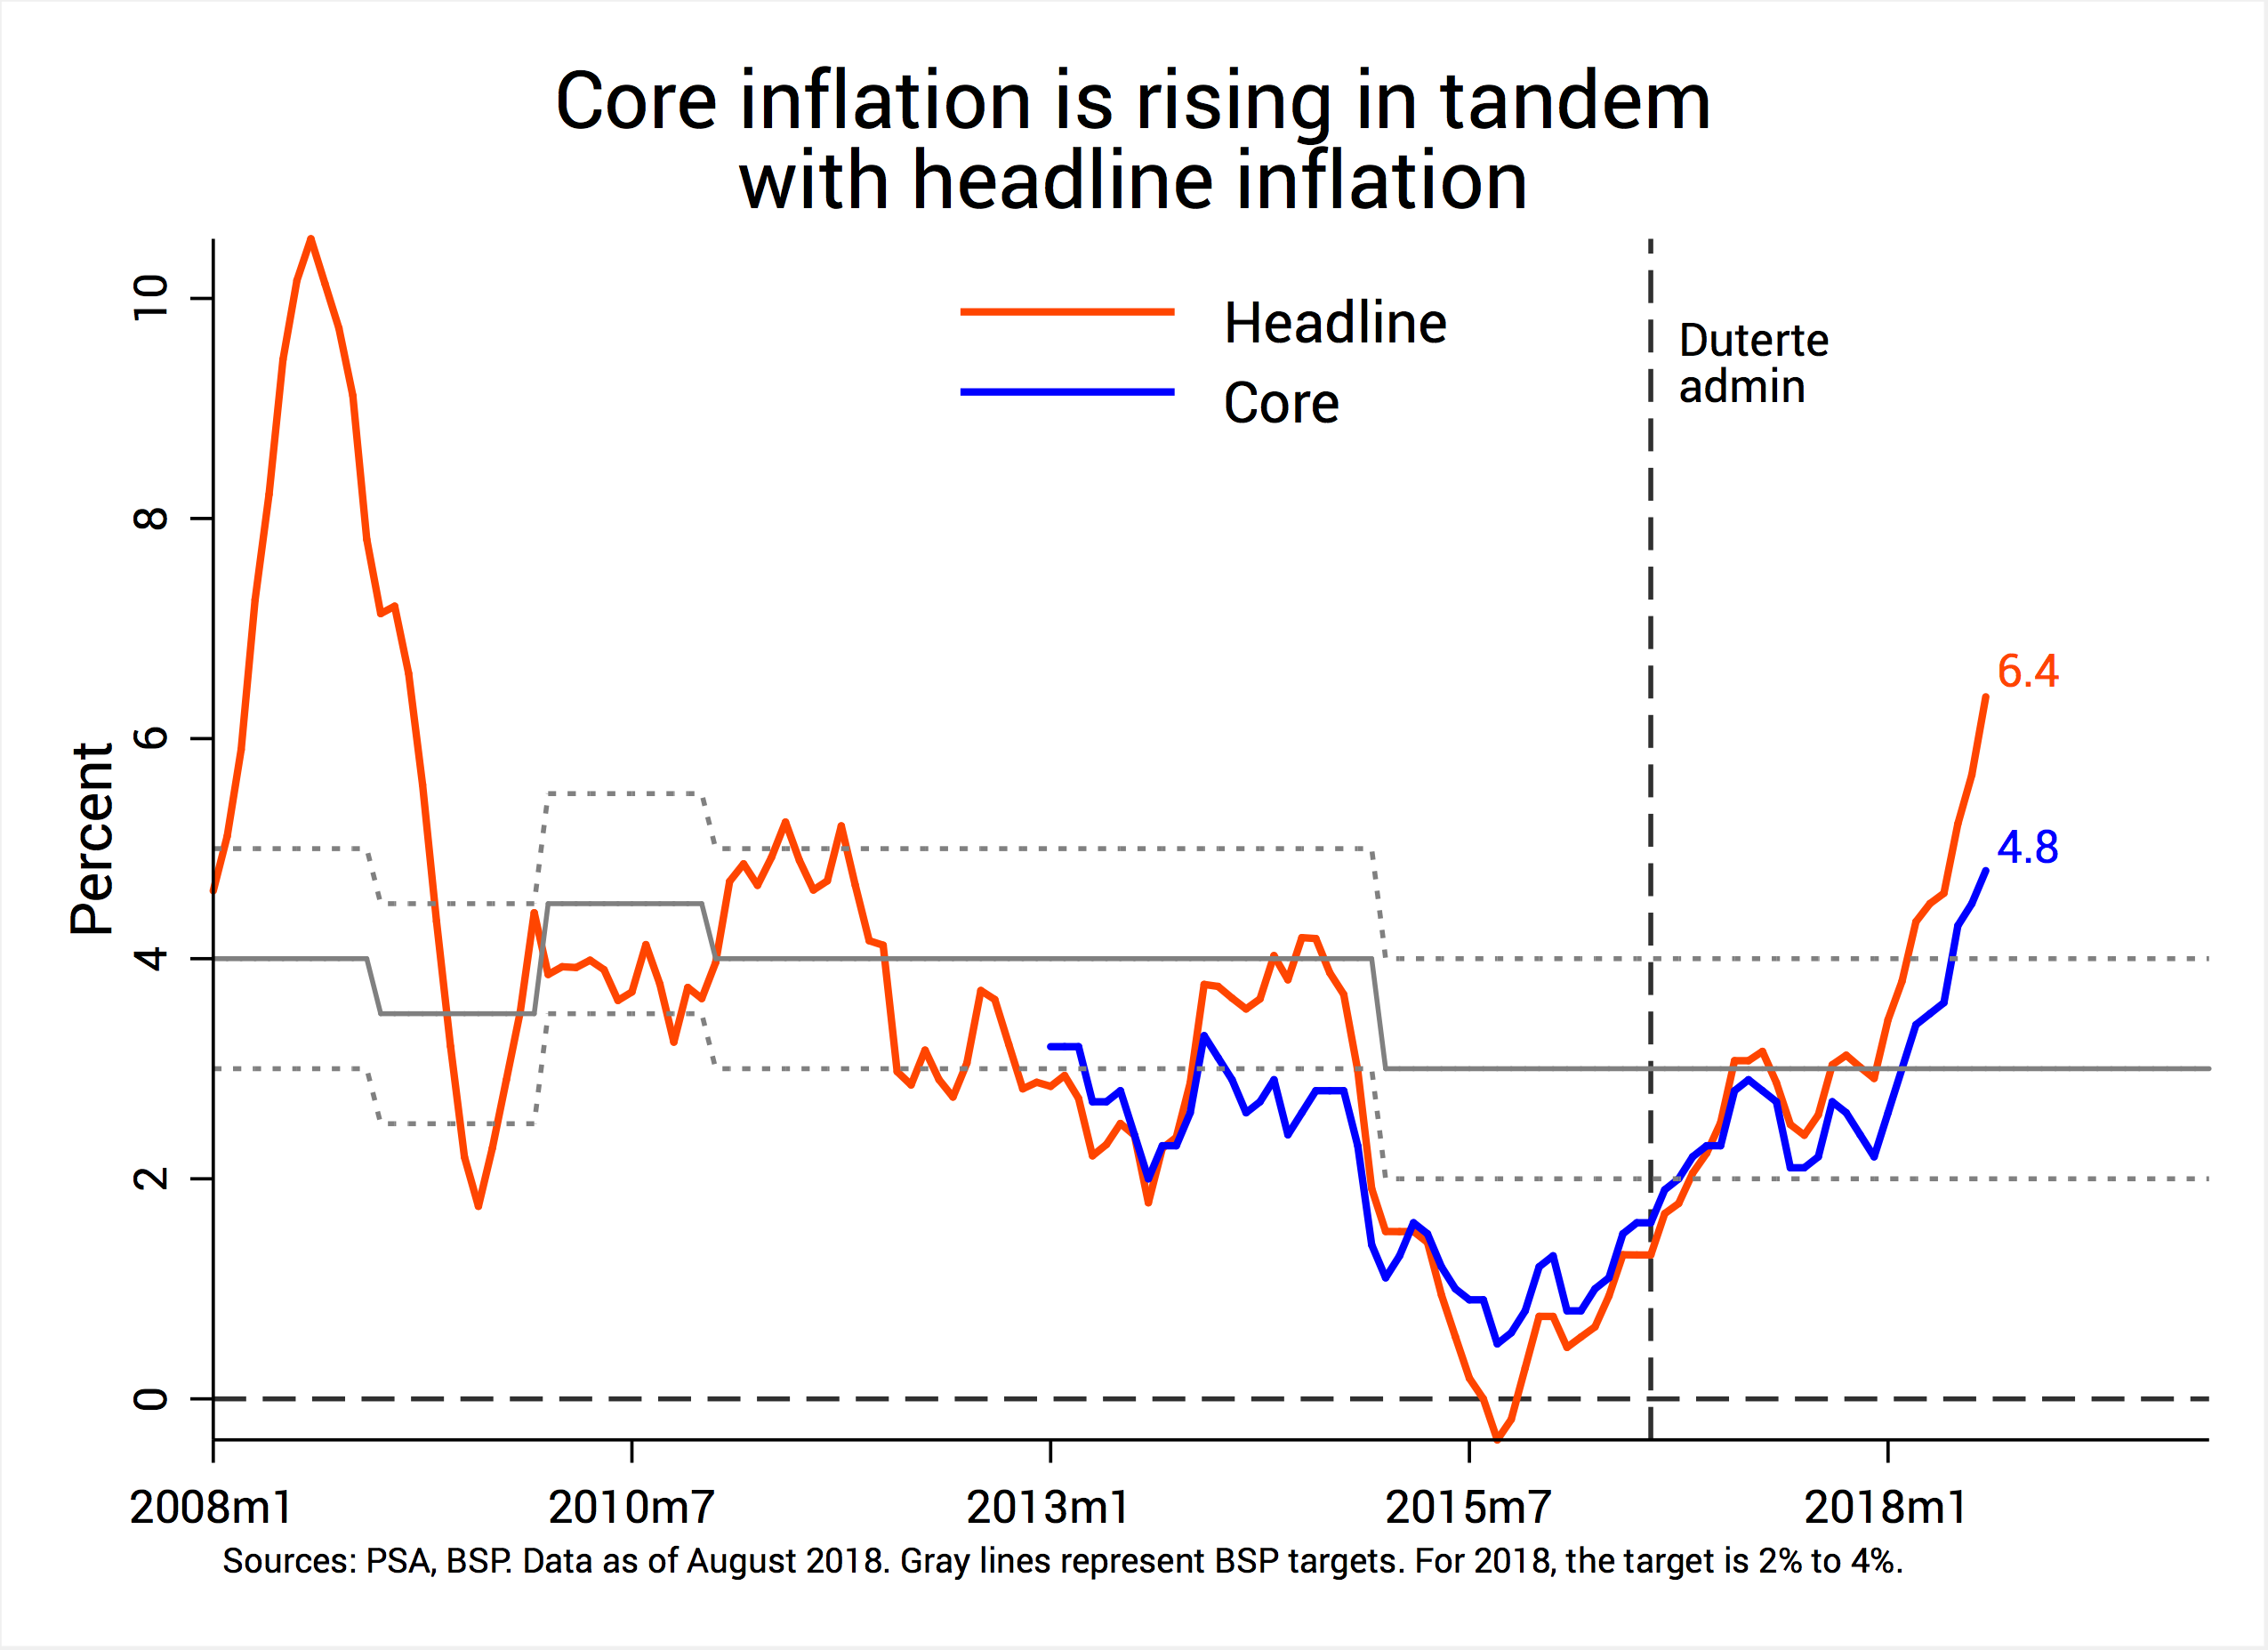 egypts headline inflation surges - HD1200×873